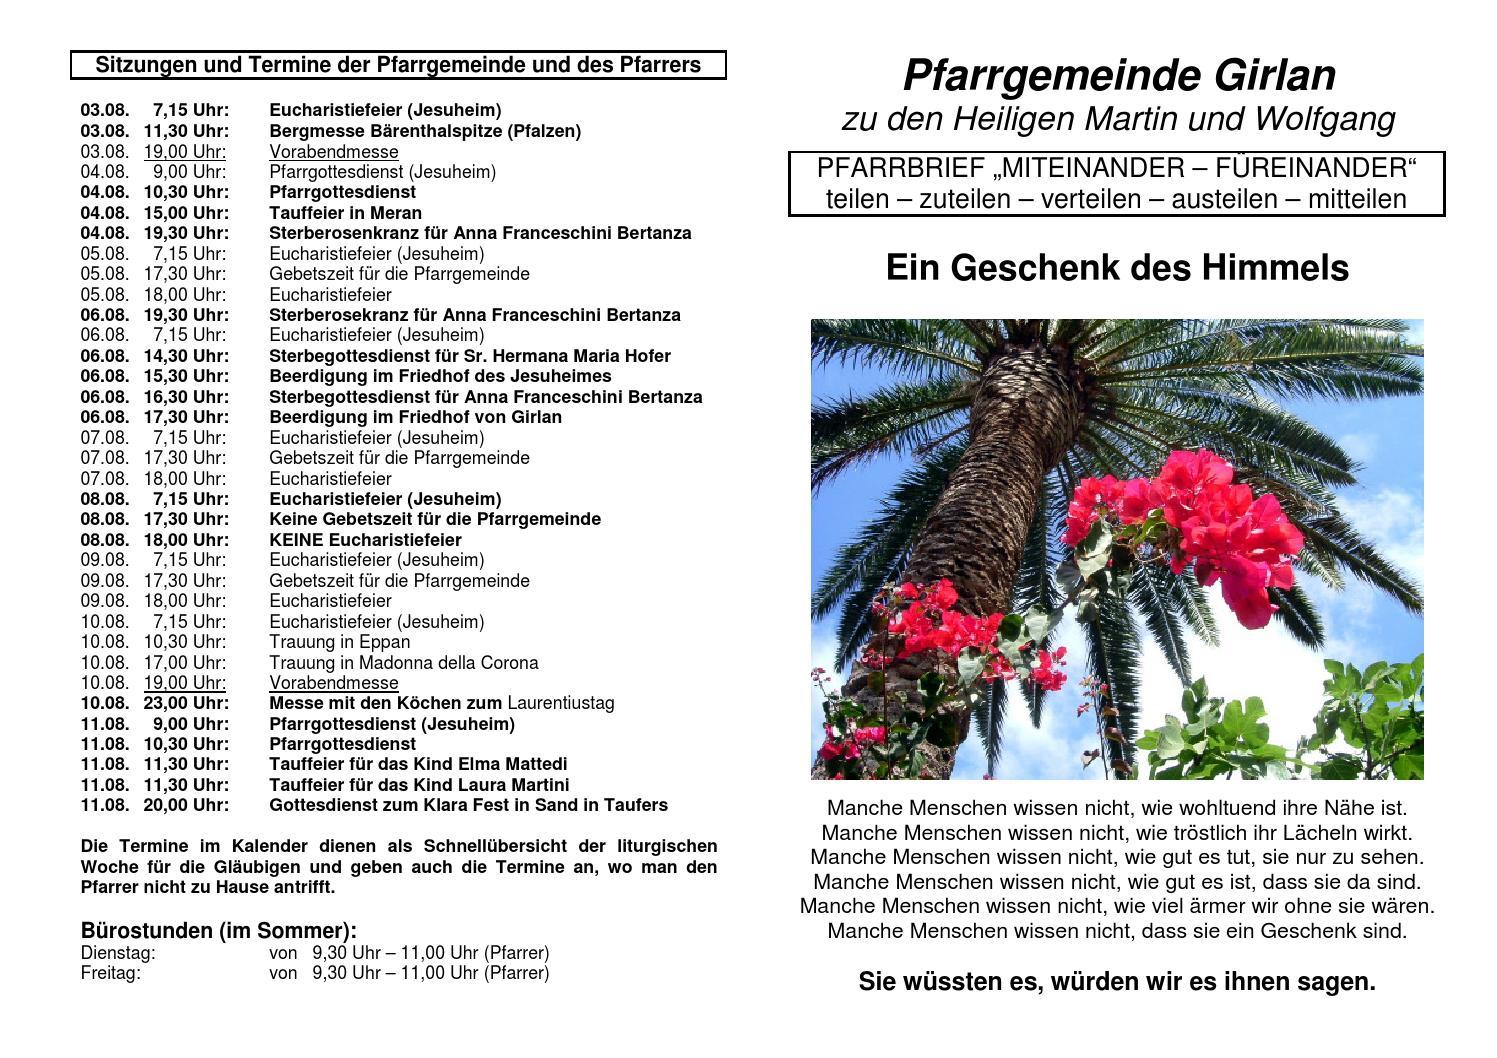 Mitteilungsblatt 2013 Nr 31 By Girlan Bibliothek Issuu